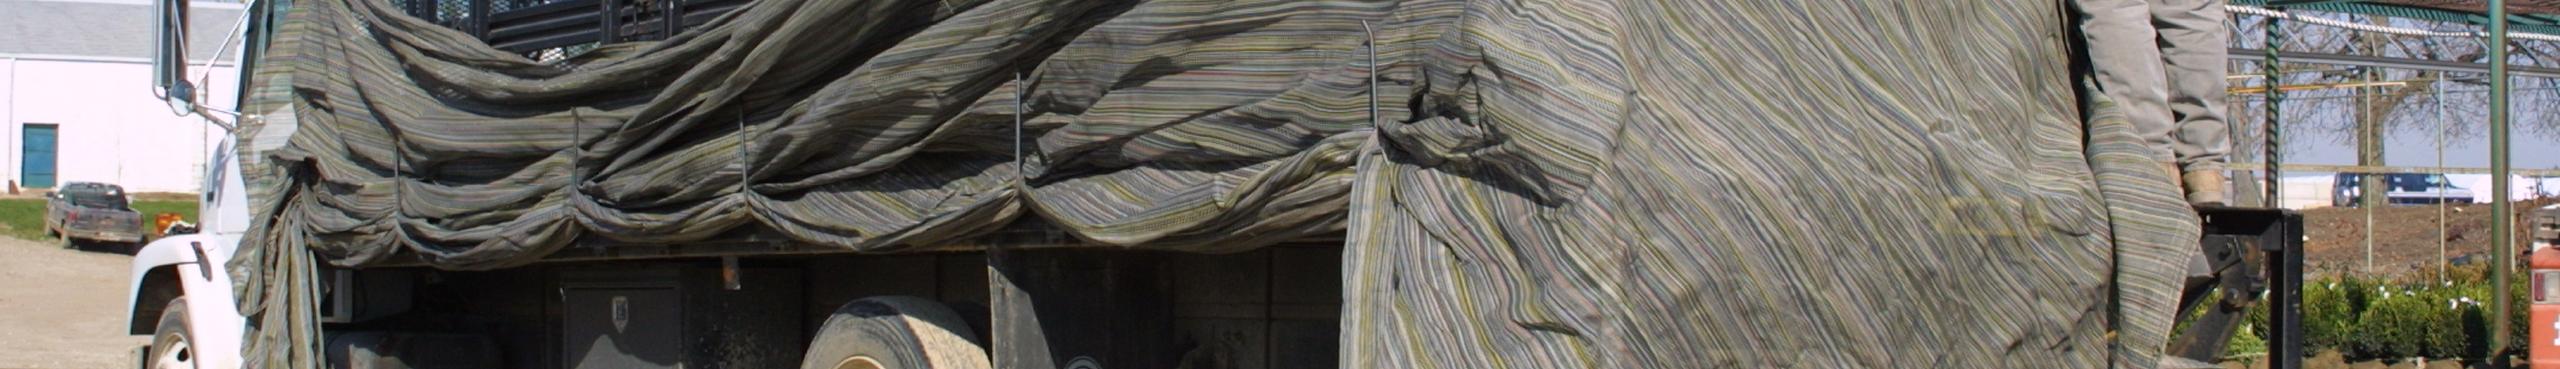 Industrial - Shade Fabric Tarp Lightweight Truck Covers